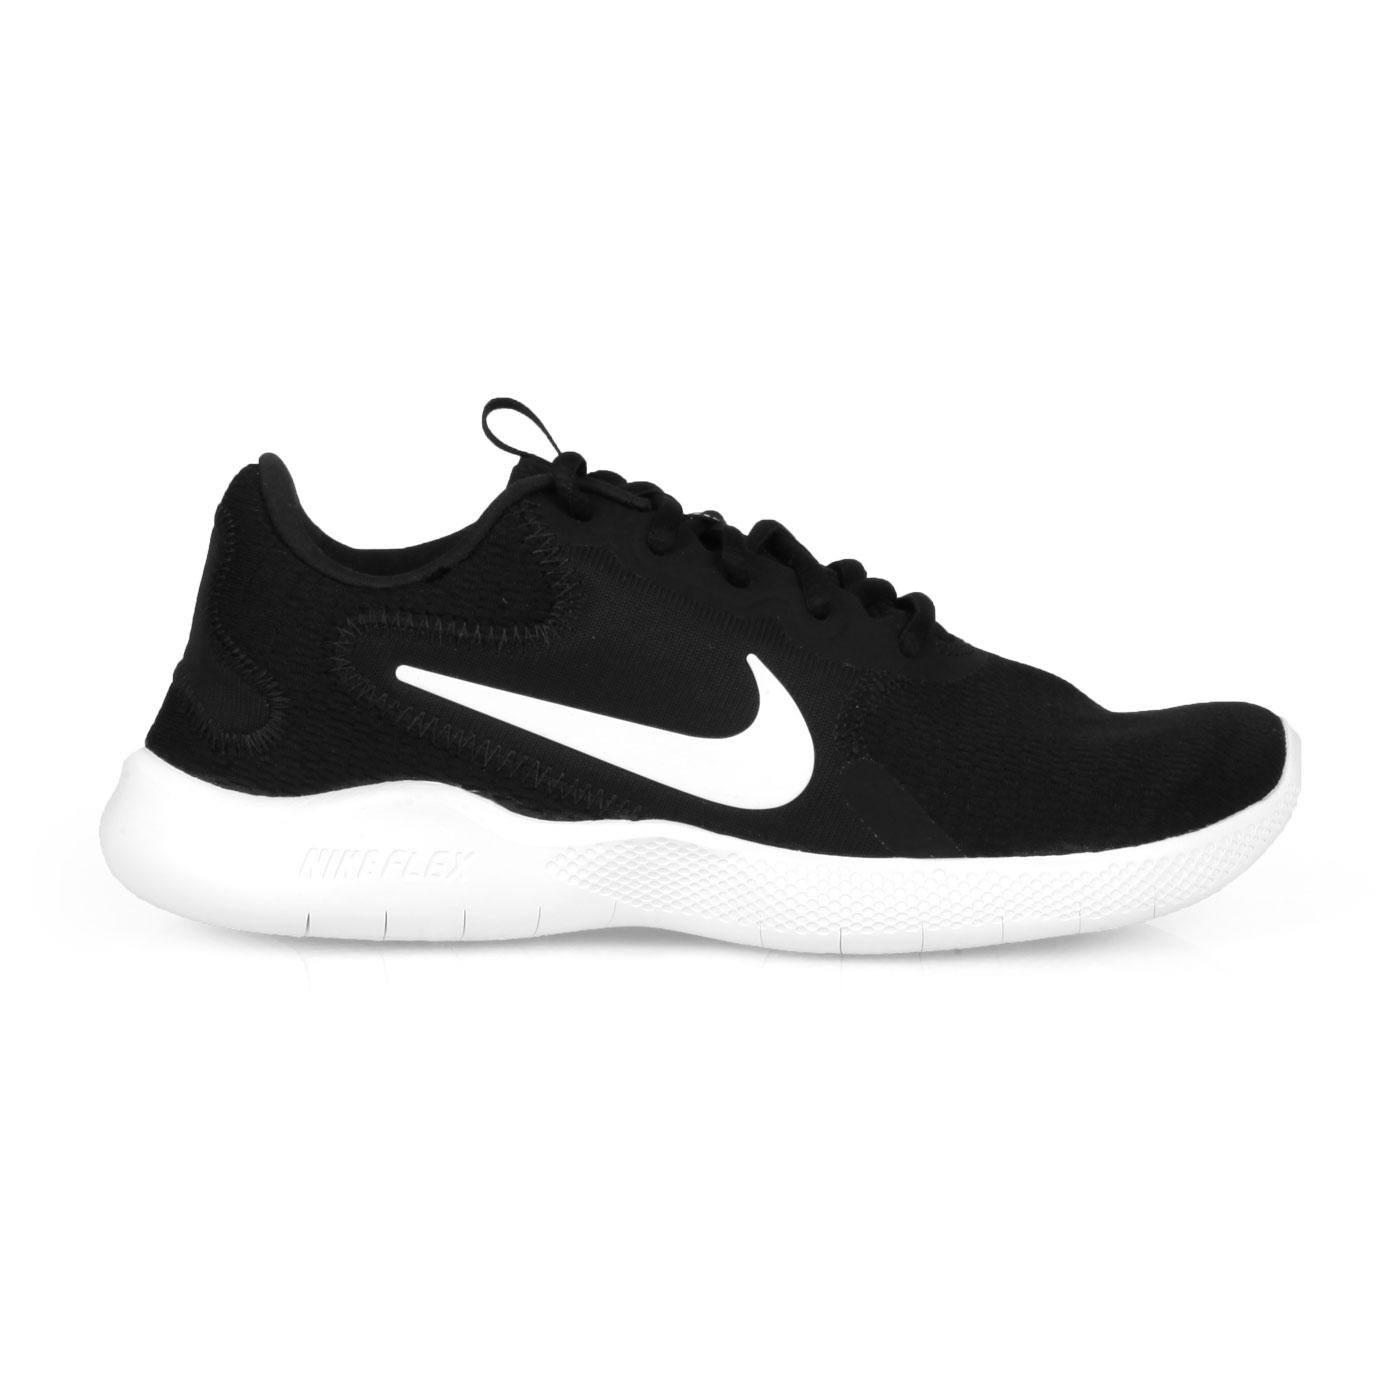 NIKE 女款休閒運動鞋  @W  FLEX EXPERIENCE RN 9@CD0227001 - 黑白